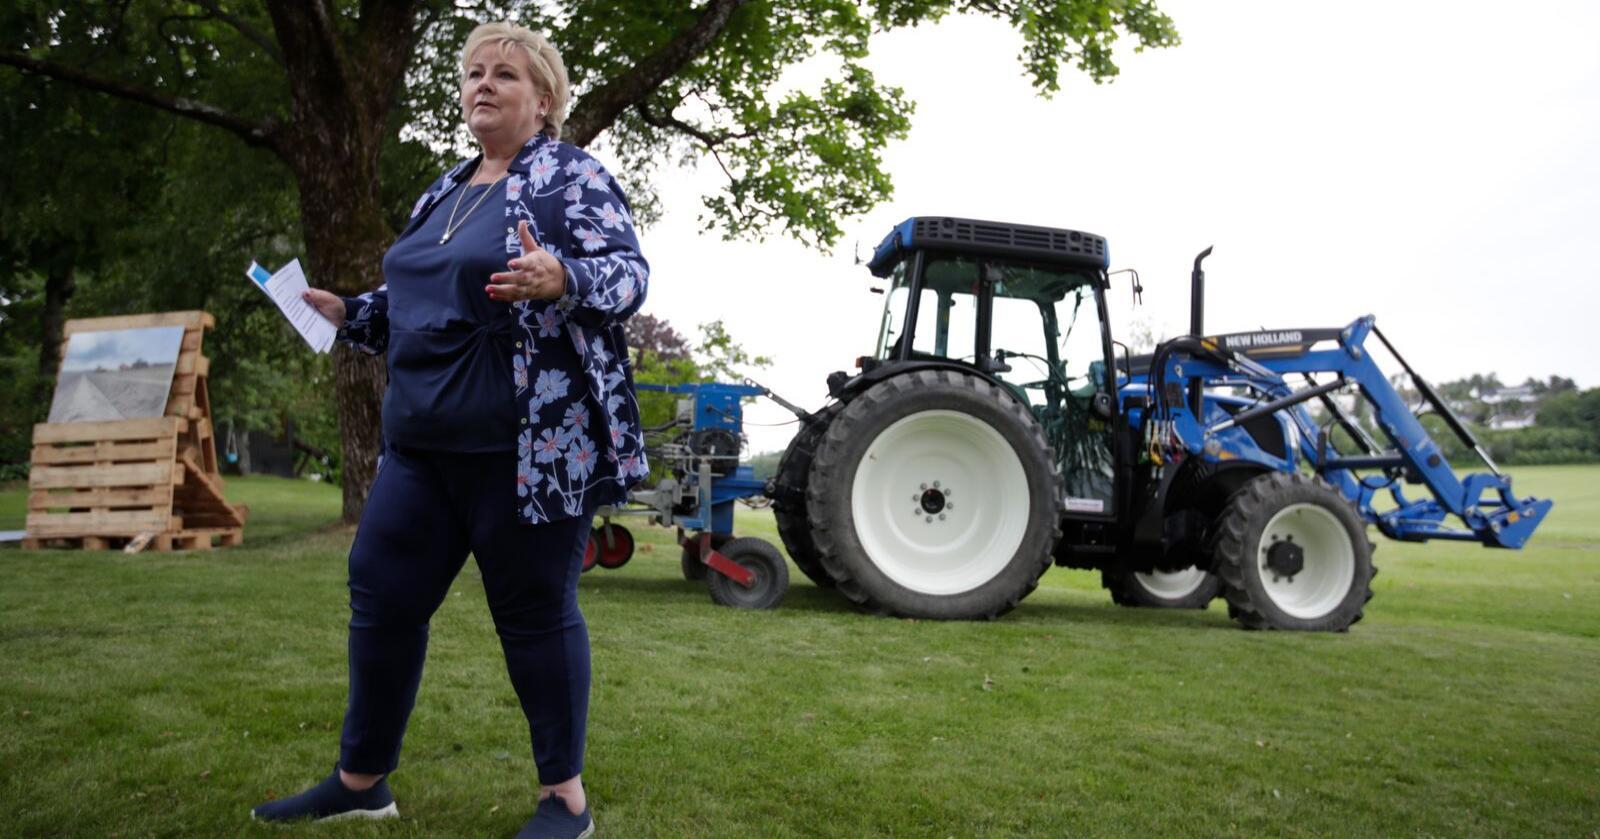 Statsminister Erna Solberg (H) på Smidsrød gard under valkampturneen før stortingsvalet 2021. Foto: Hanna Johre / NTB